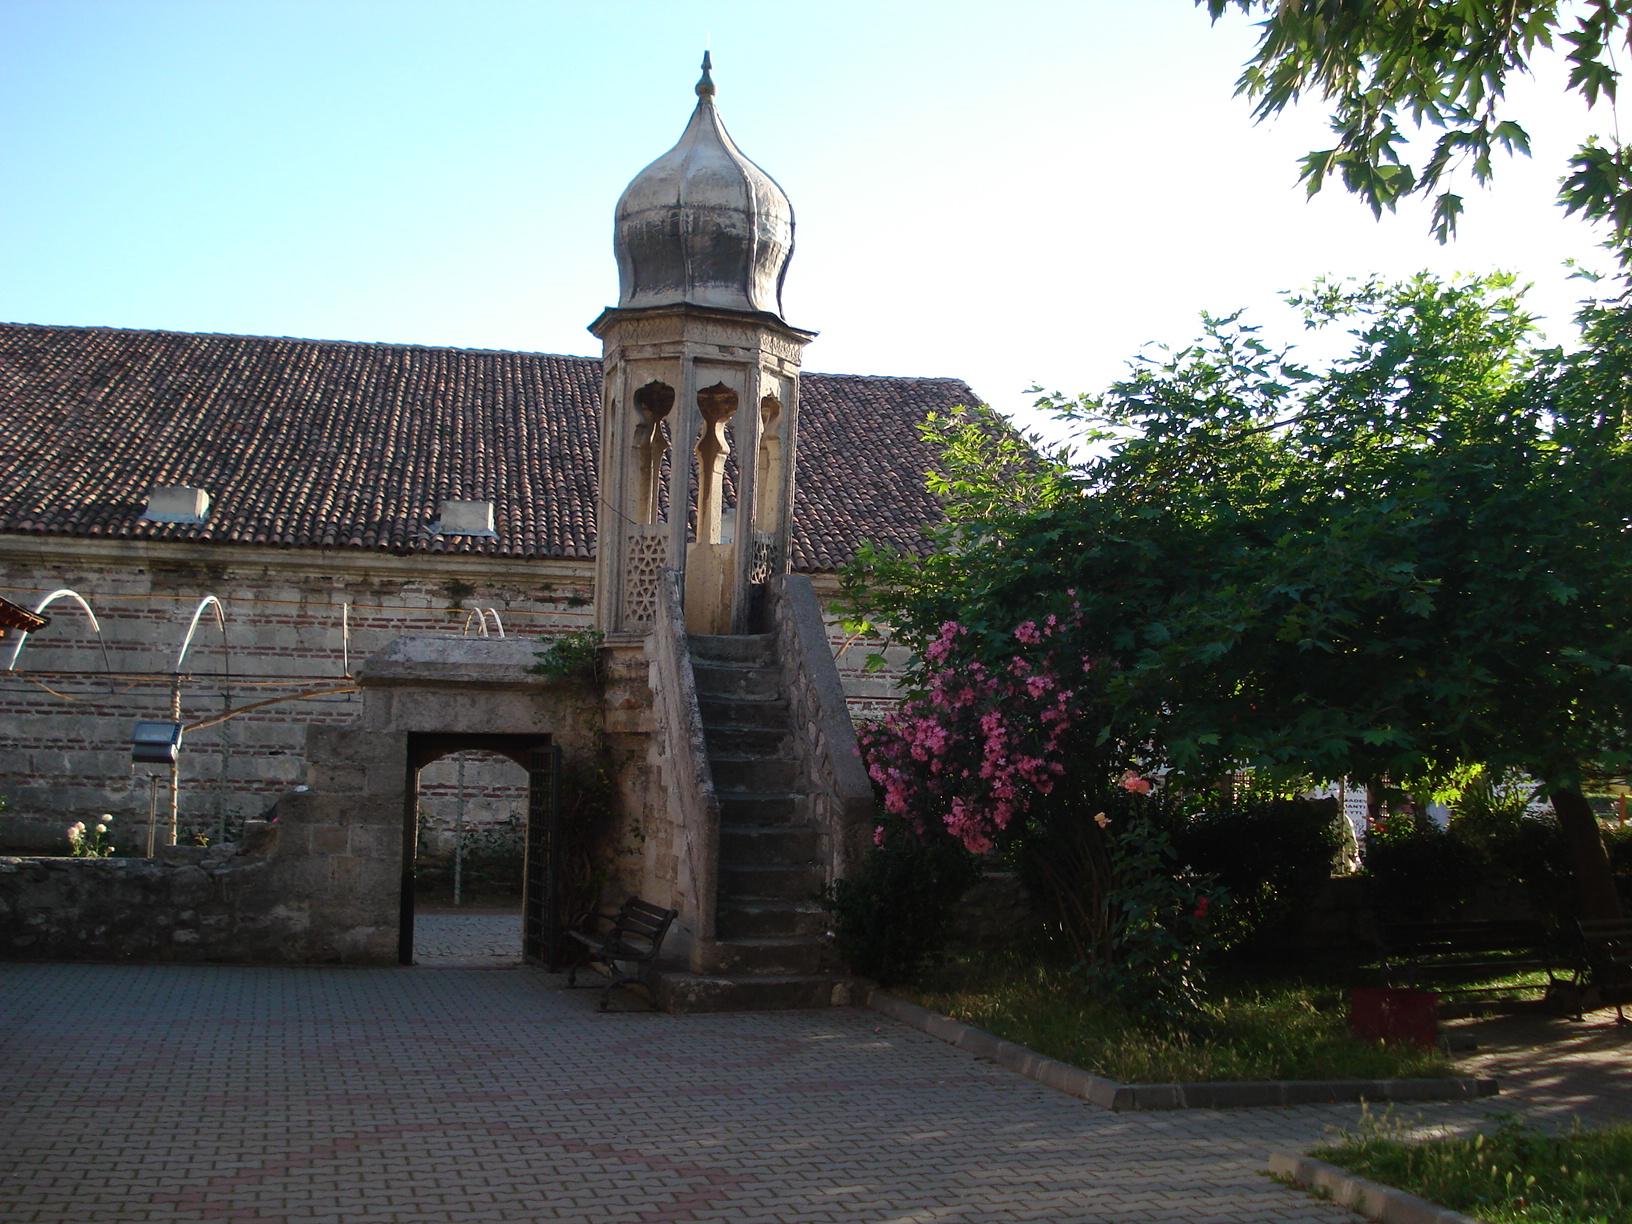 File:Sokullu Mehmet Paşa Camii.JPG - Wikimedia Commons